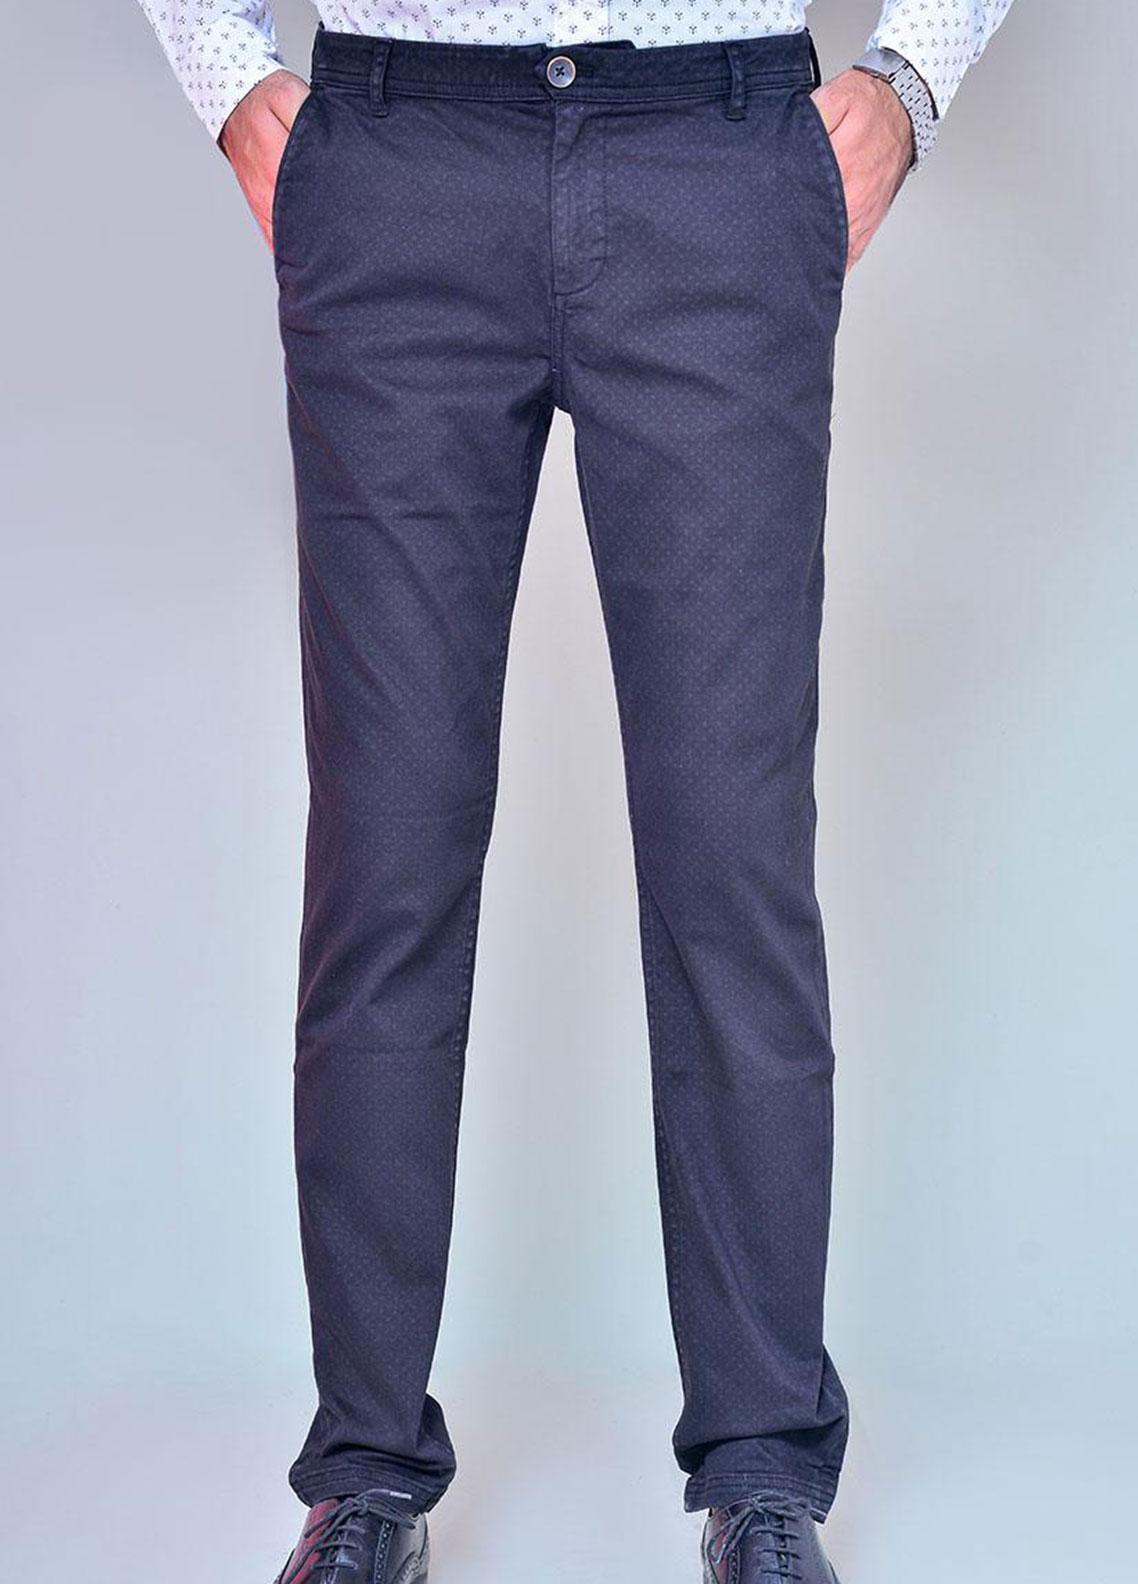 Ignite Wardrobe Cotton Pattern Chino Pants for Men -  IG20PNM 041